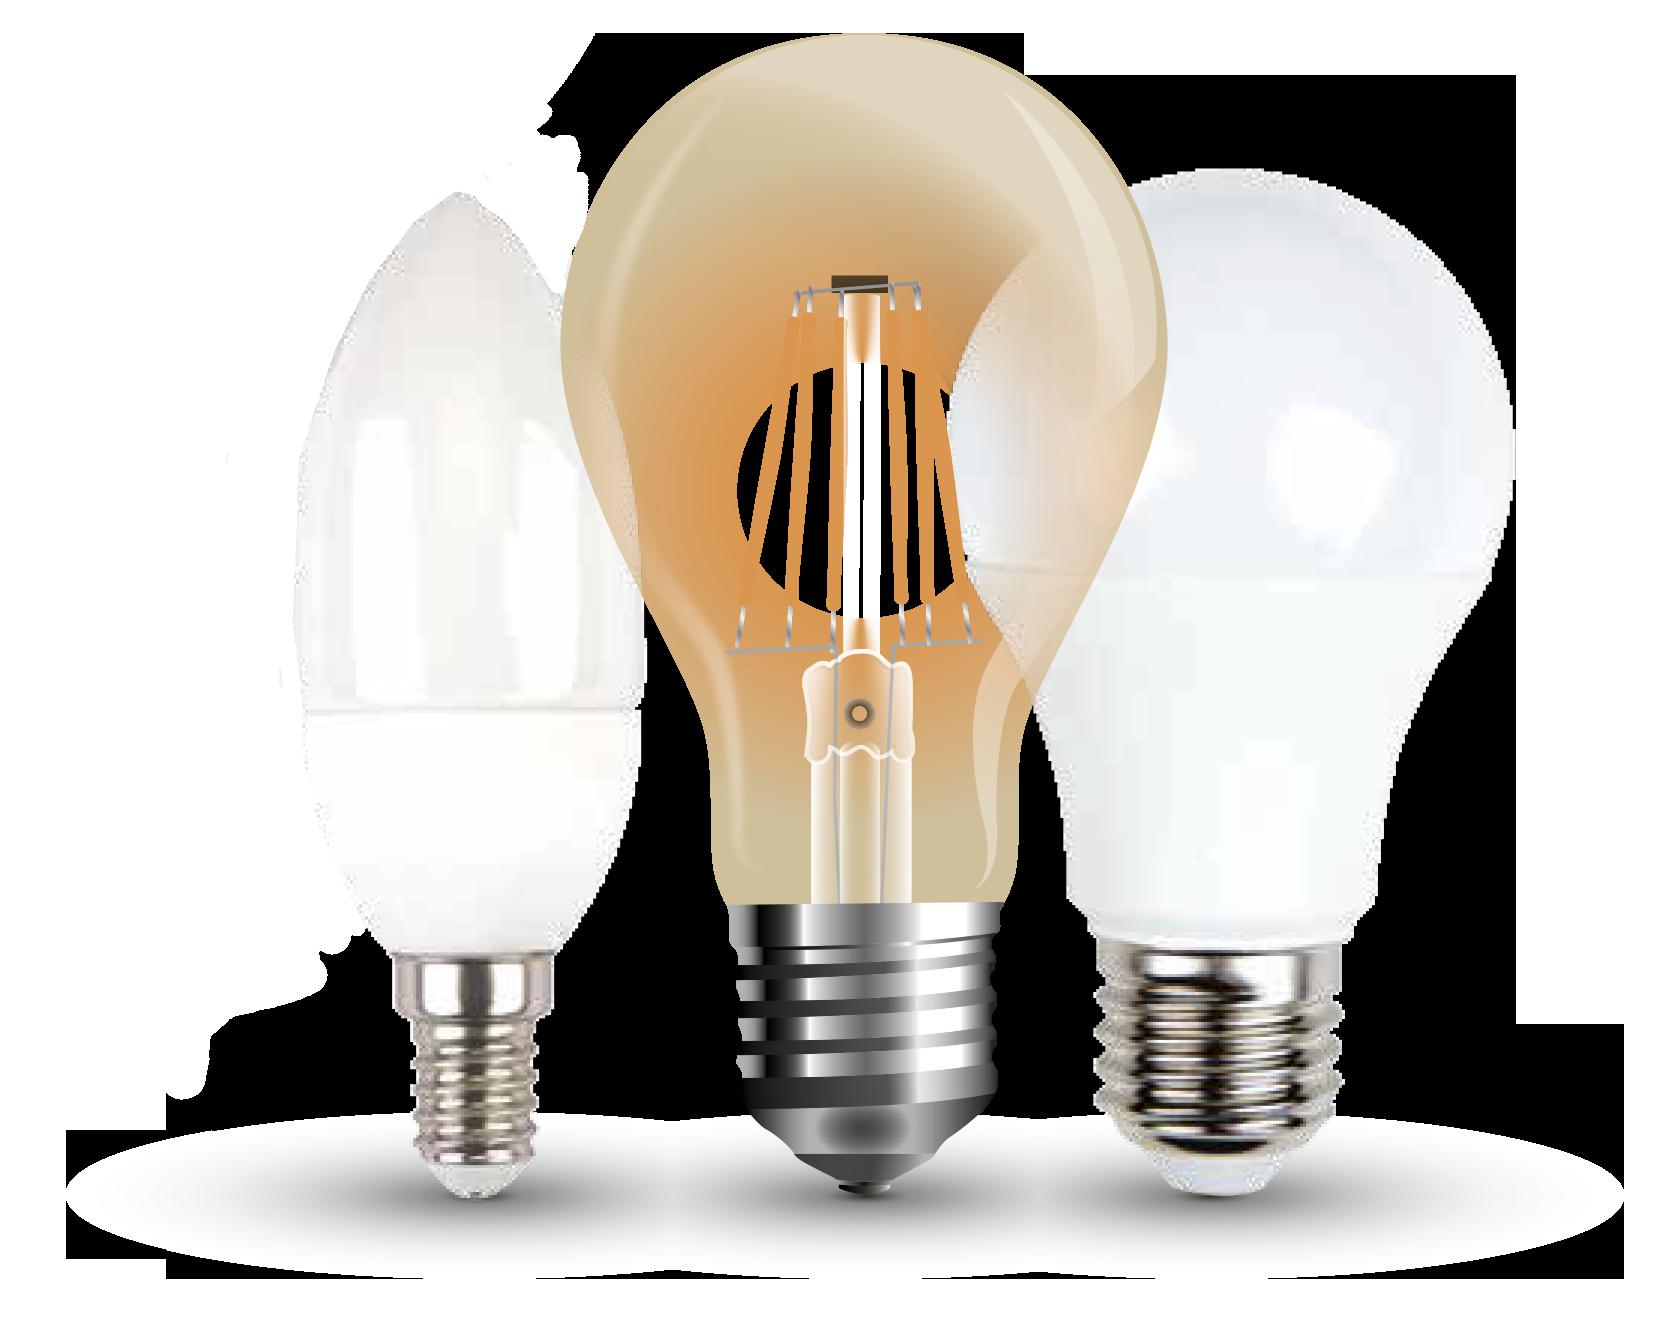 Ofertas iluminaci n led y material el ctrico en lucena cima leds - Lamparas lucena ...